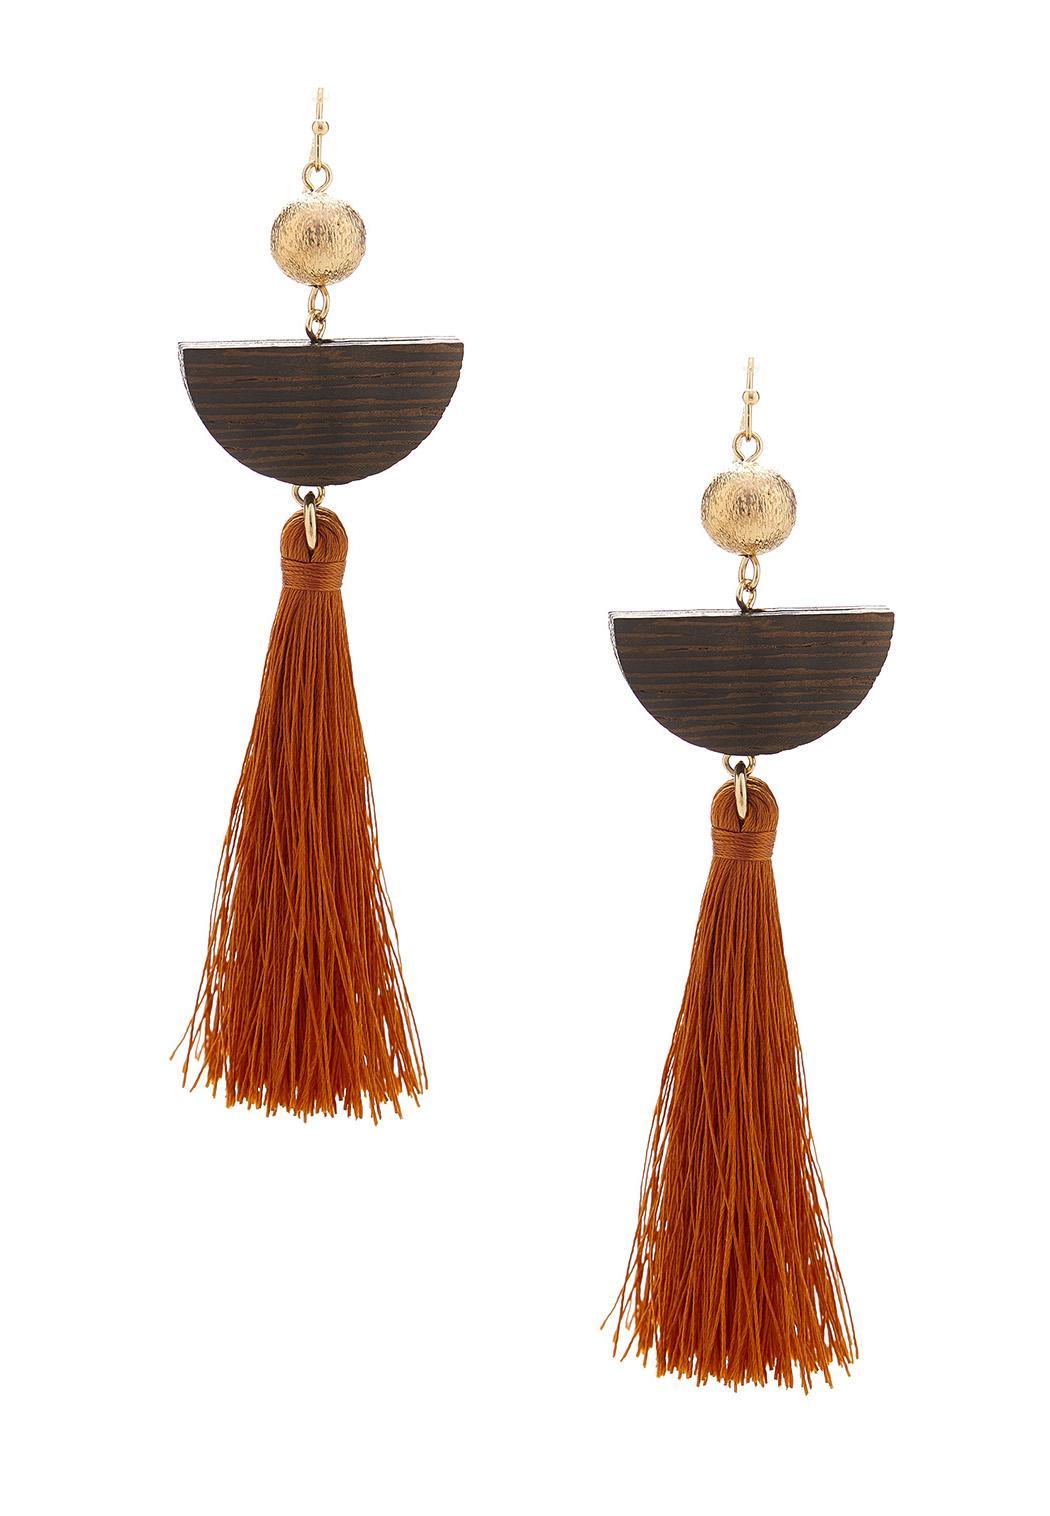 Wood Crescent Tassel Earrings